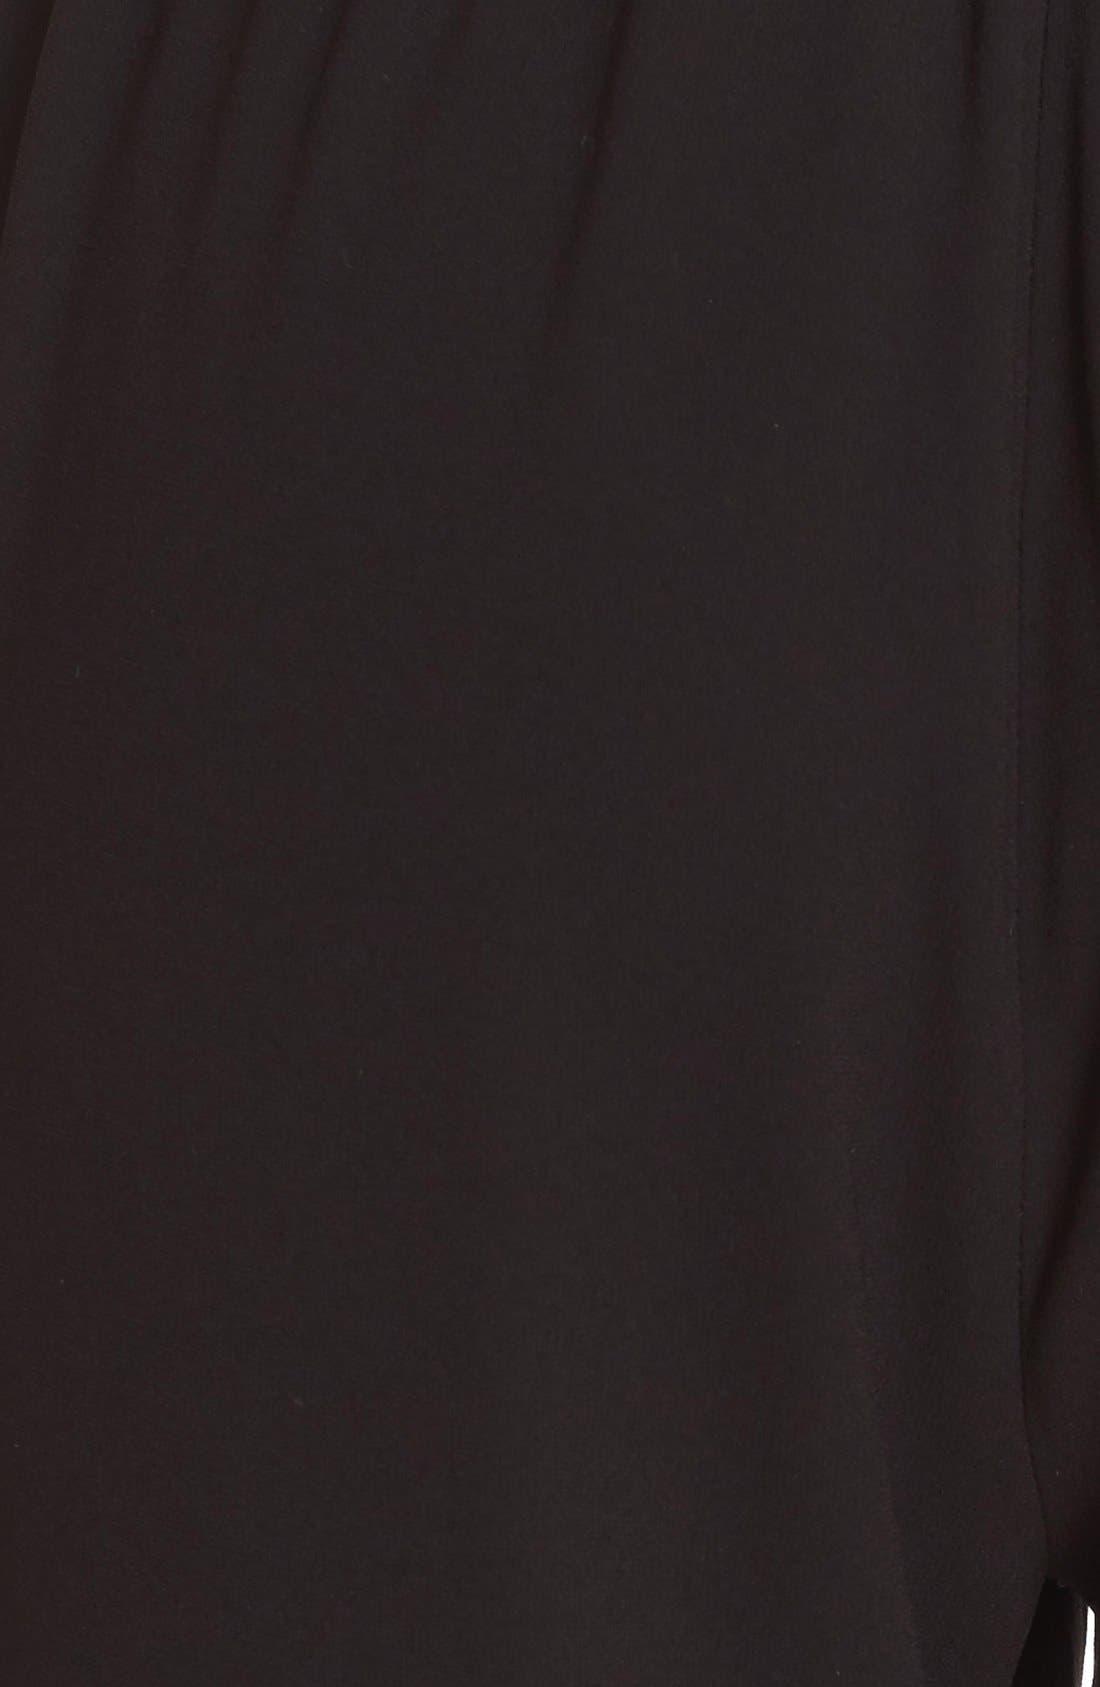 St. John Sport Collection Satin Back Crepe Pants,                             Alternate thumbnail 3, color,                             001